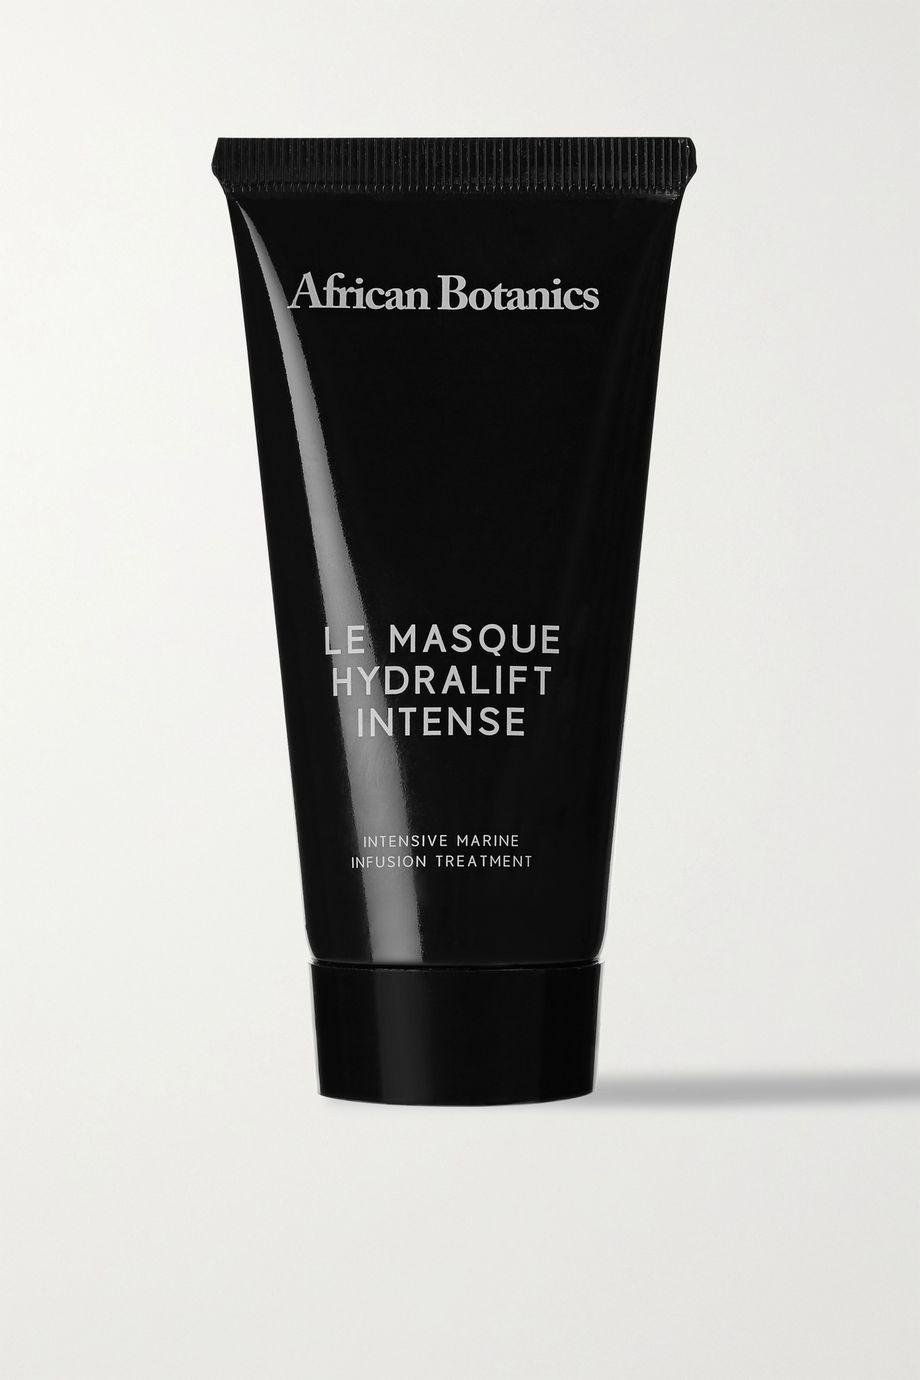 African Botanics Le Masque HydraLift Intense, 50ml